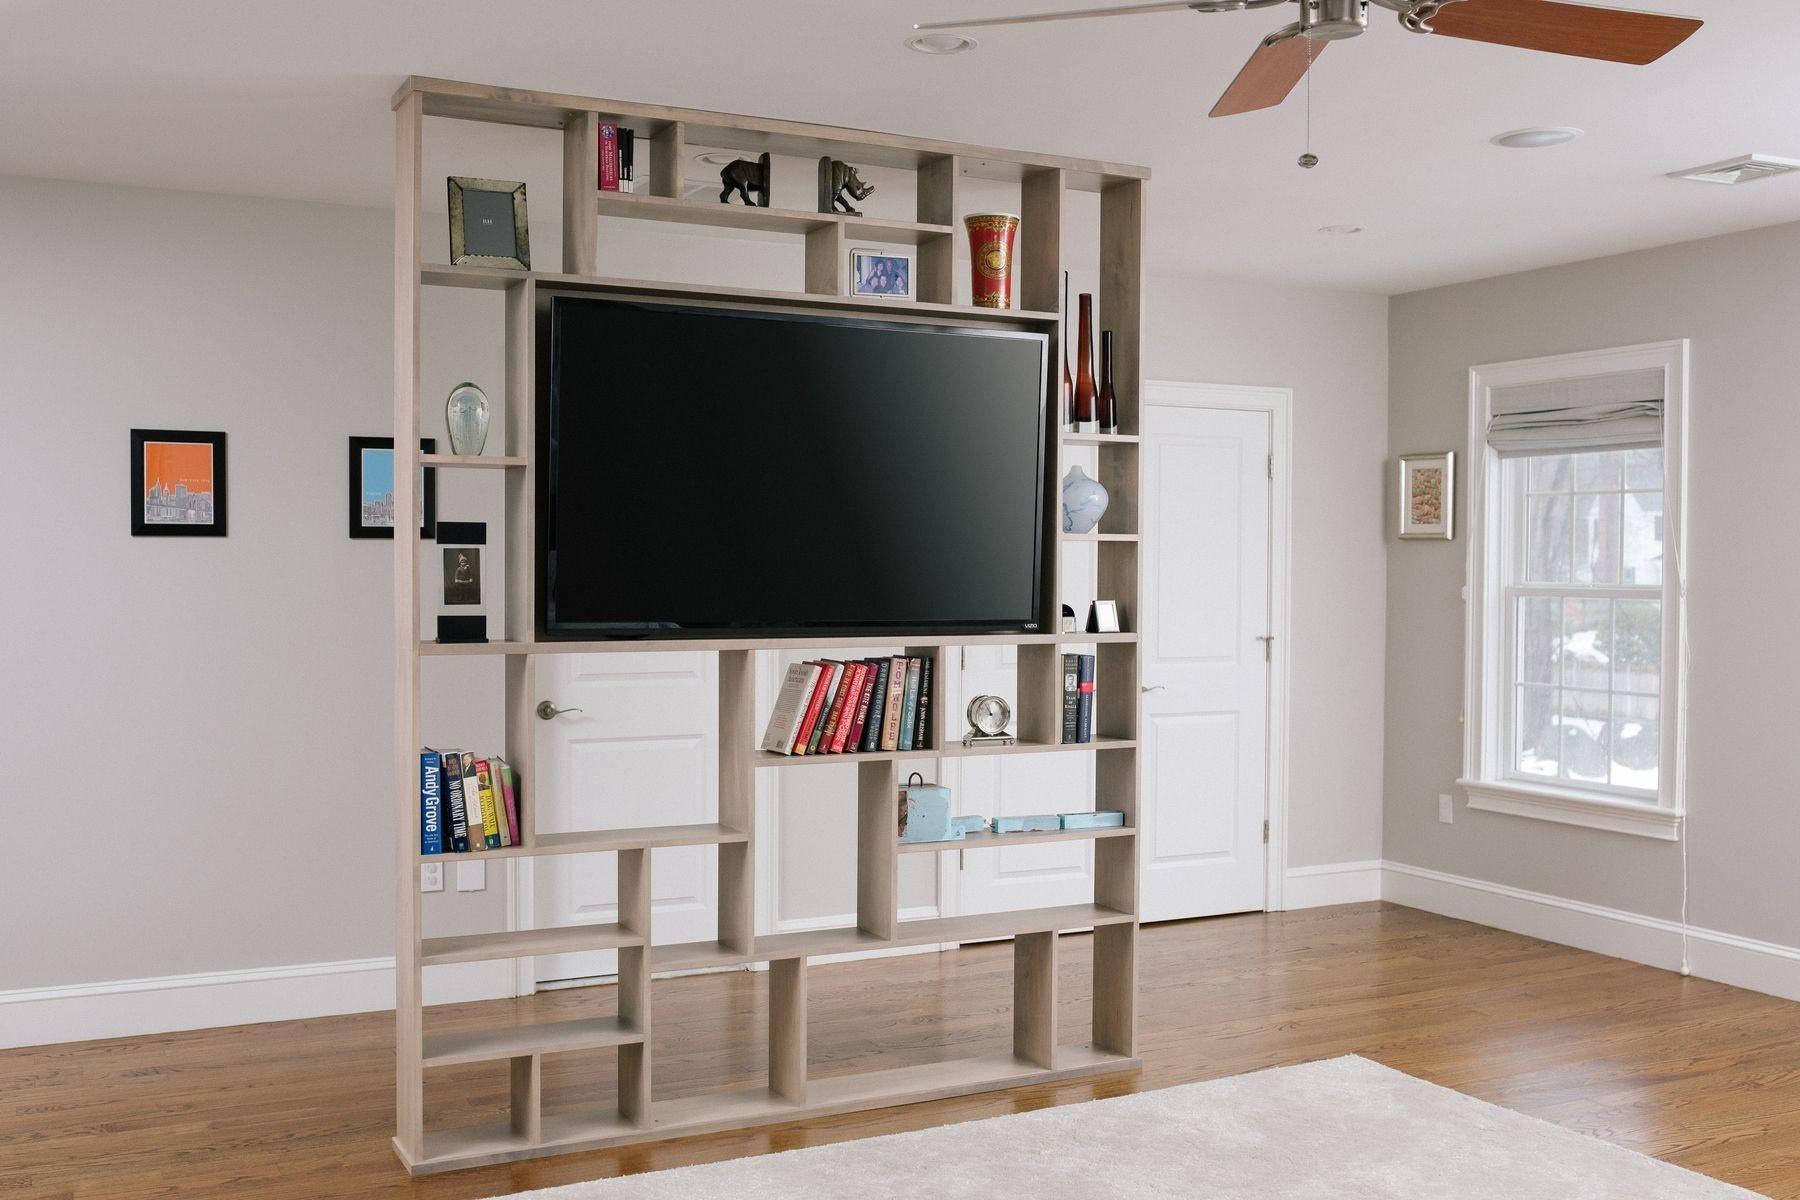 Hand Crafted Lexington Room Divider Bookshelf Tv Stand Corl Inside Tv And Bookshelf (#6 of 15)